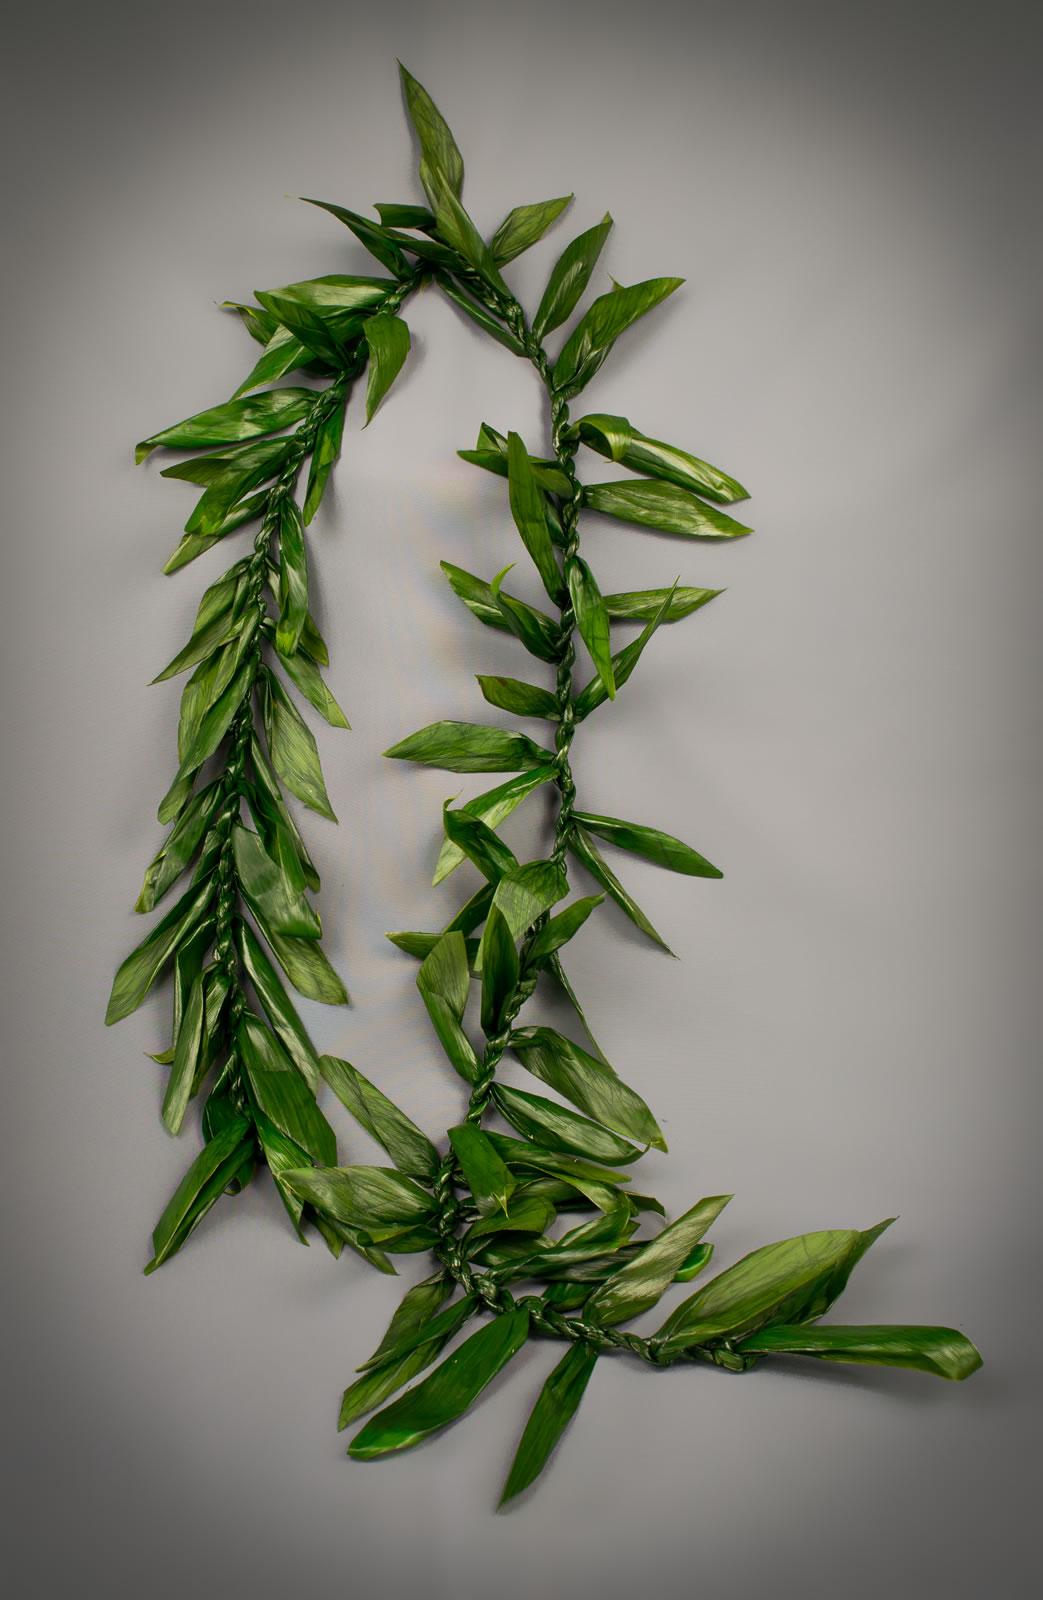 Maile ti leaf lei puna ohana tropical flowers leis home izmirmasajfo